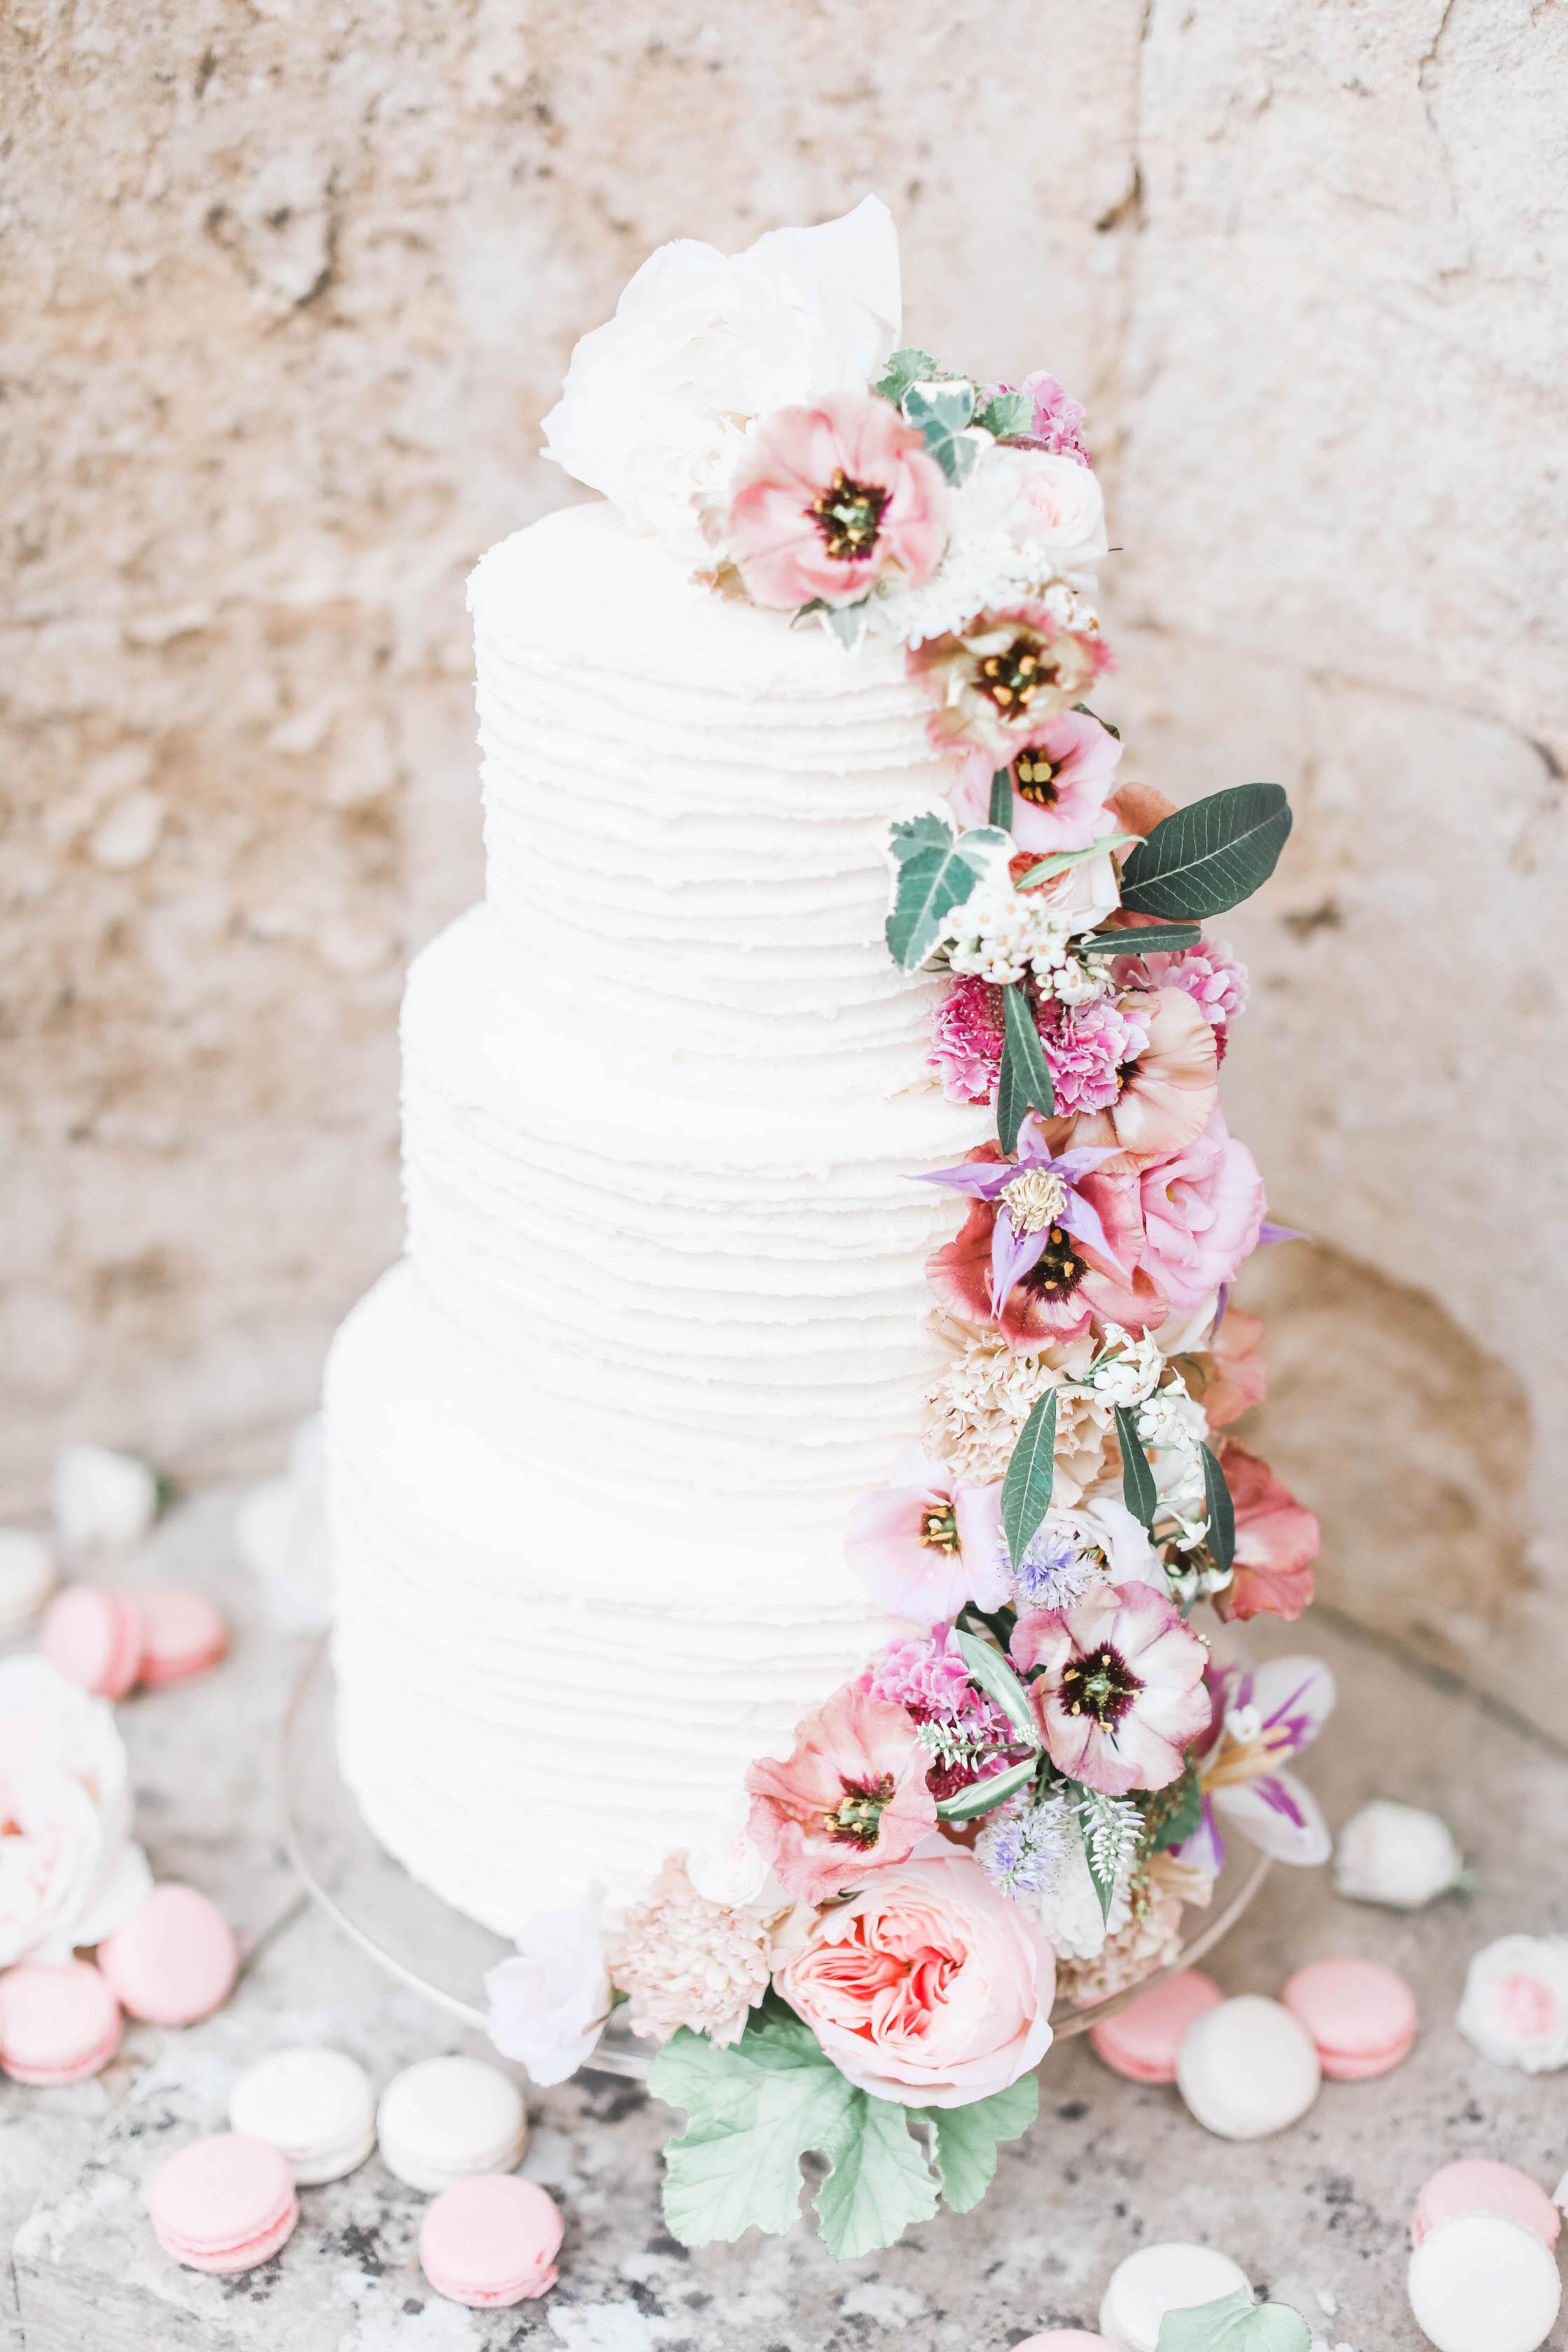 Anemone Cake Flowers - Blush Flowers - Cake Design